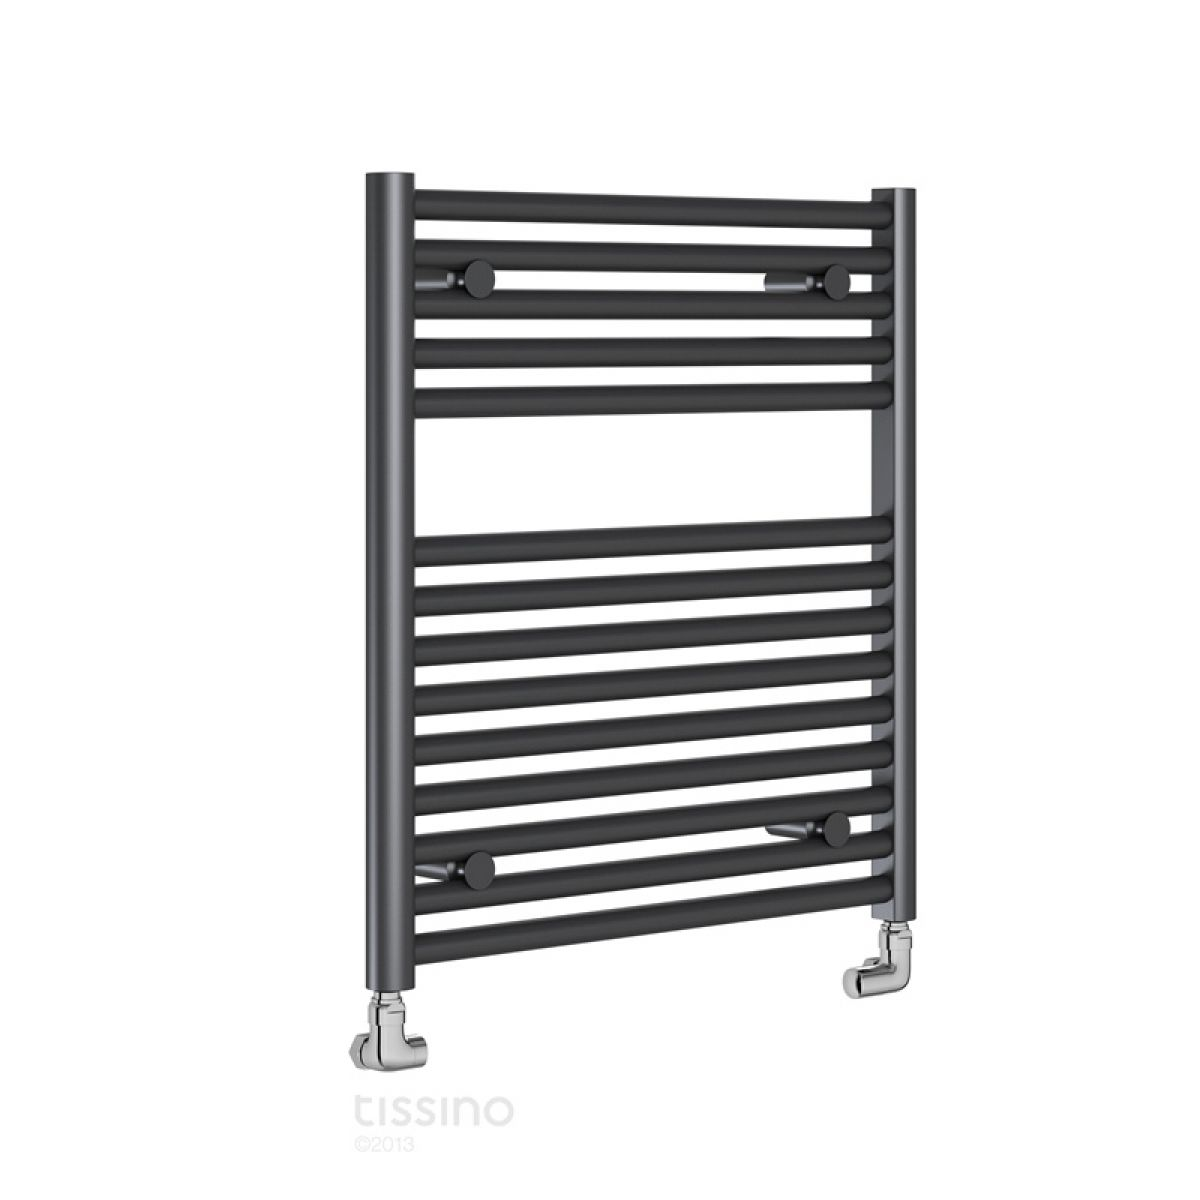 Mere Hugo2 Towel Drying Radiator - Anthracite - 31-9024